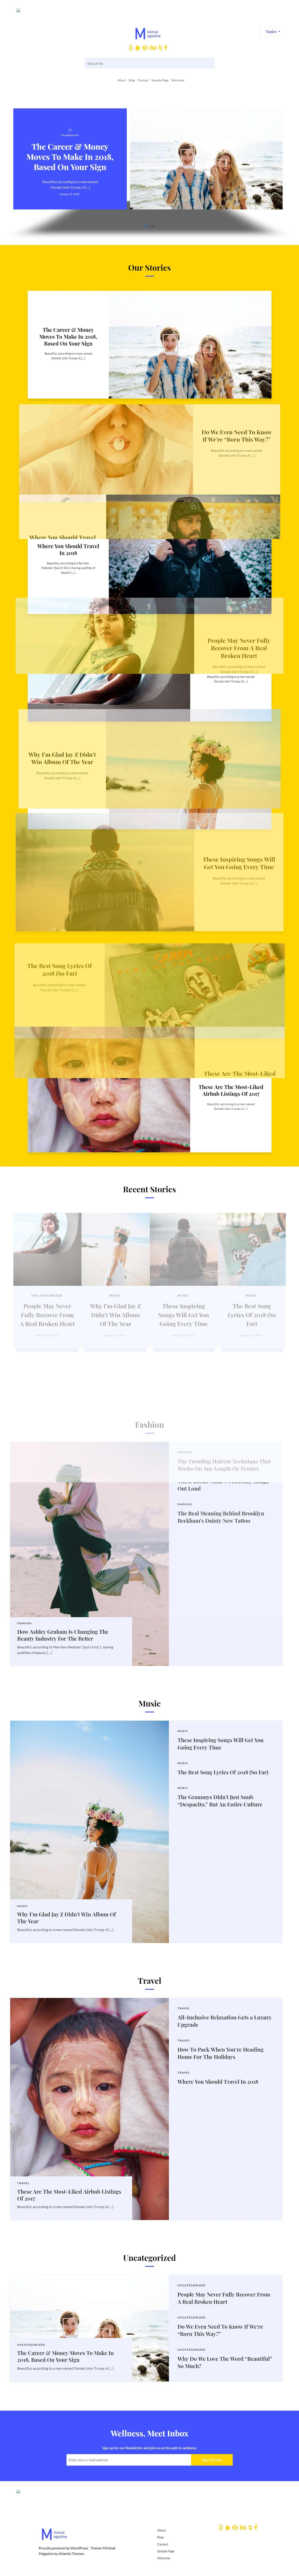 minimal maagazine best free minimal wordpress theme - 10+ Best Free Minimal WordPress Themes